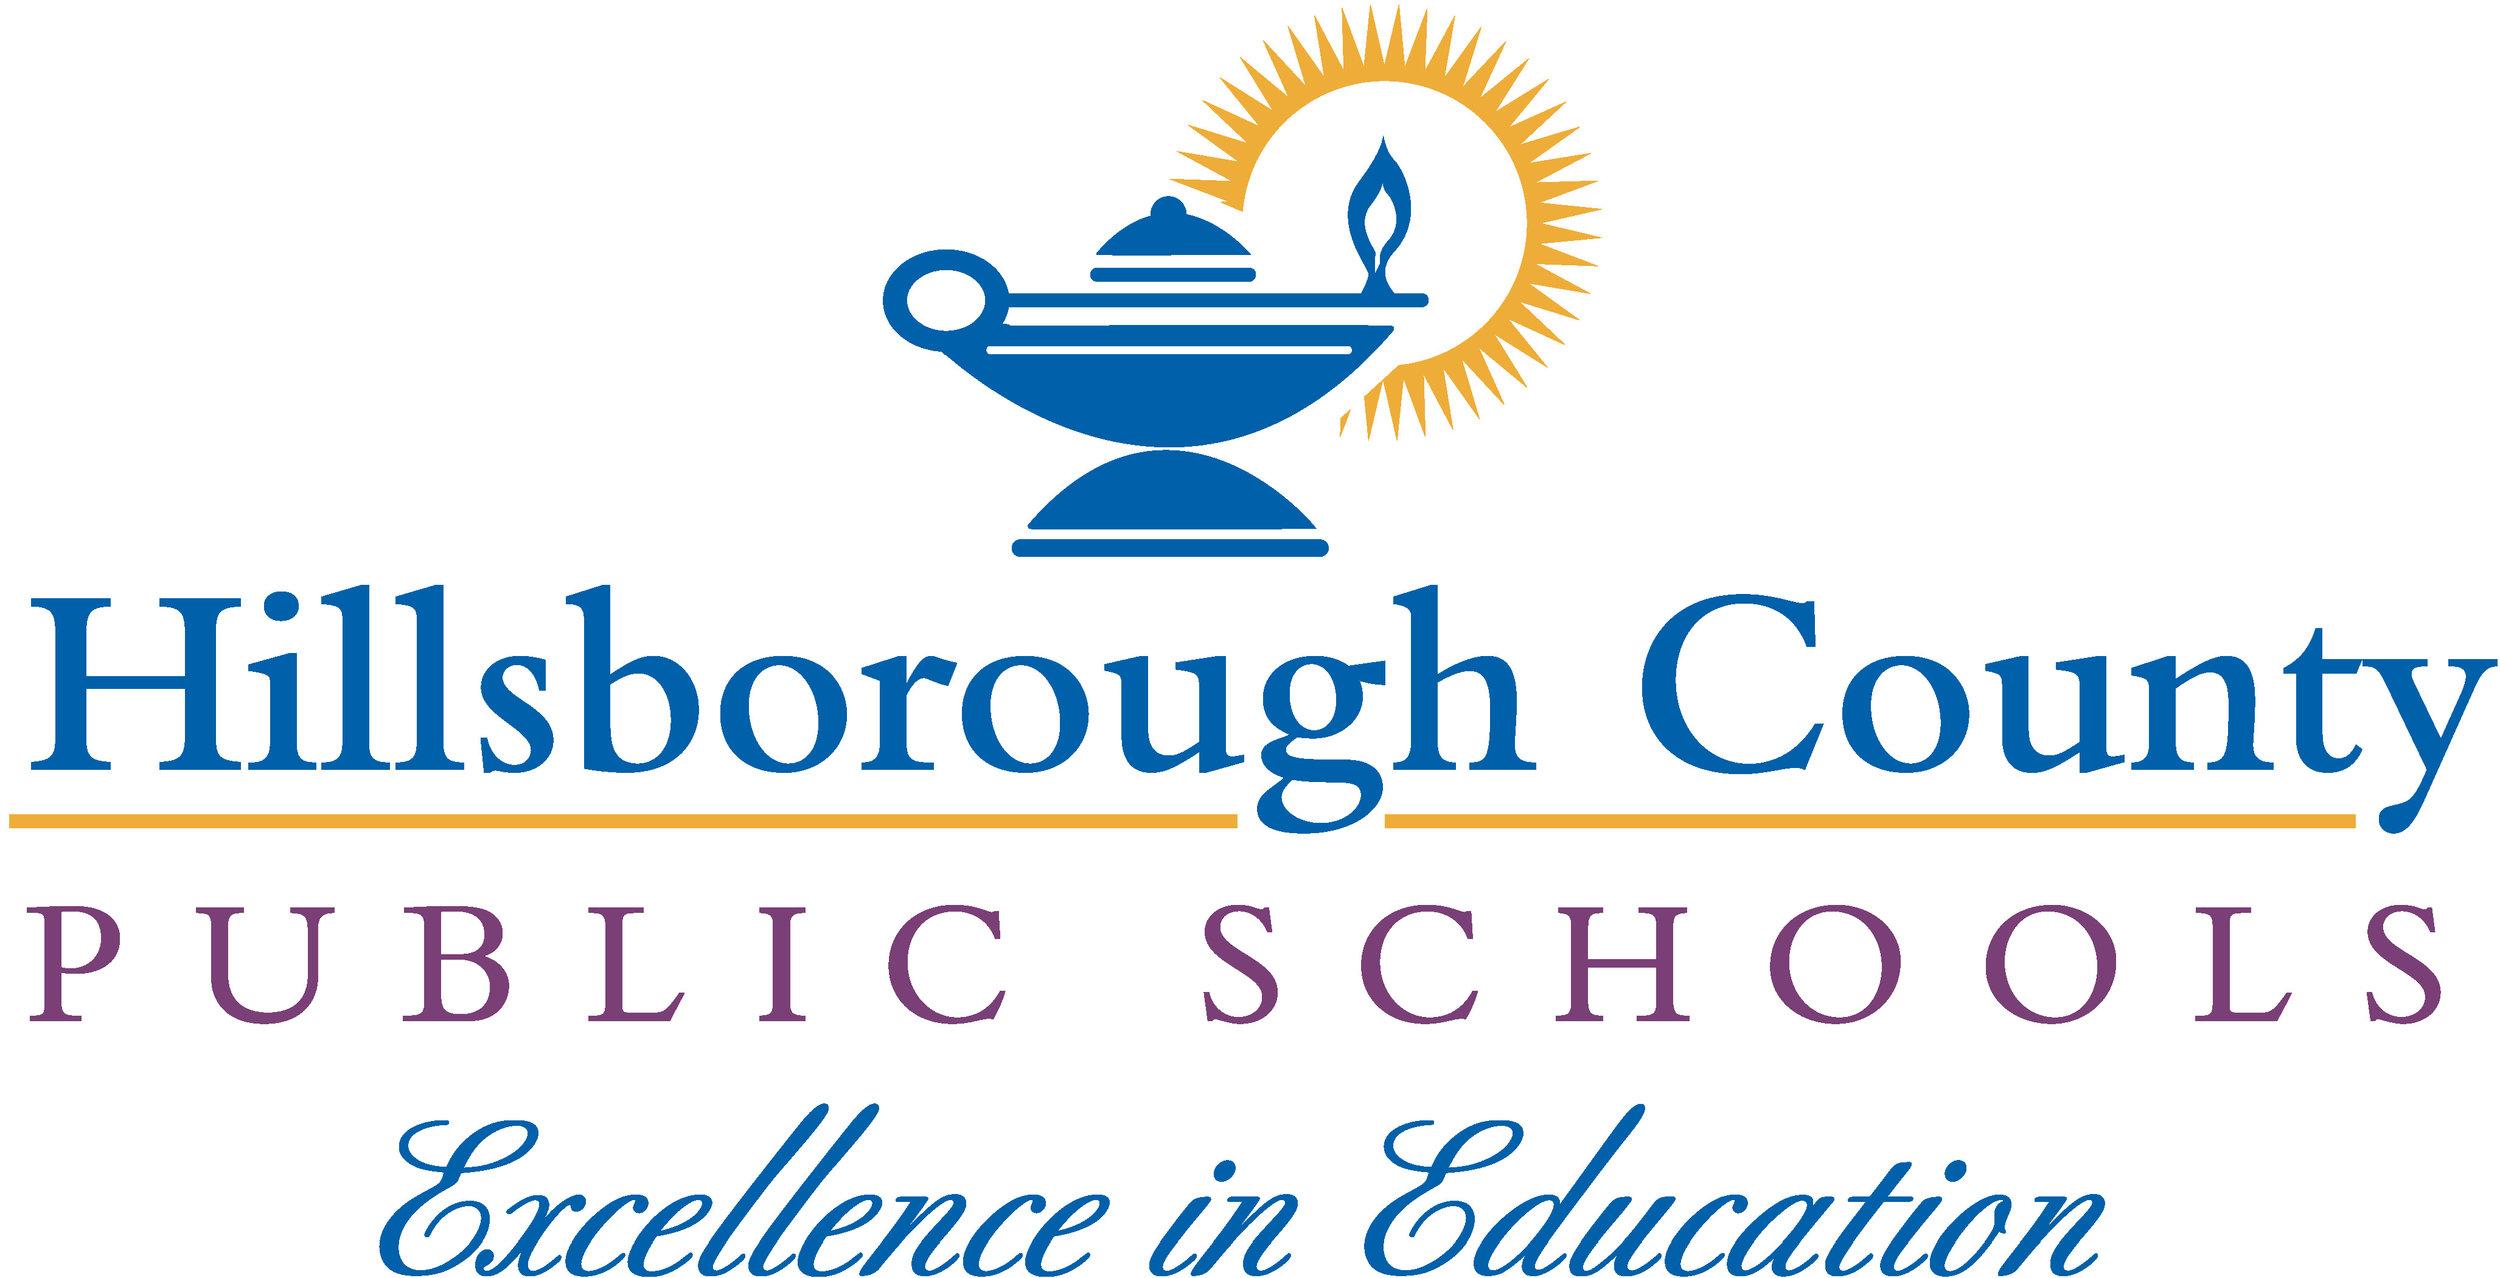 hillsborough county schools logo.jpg